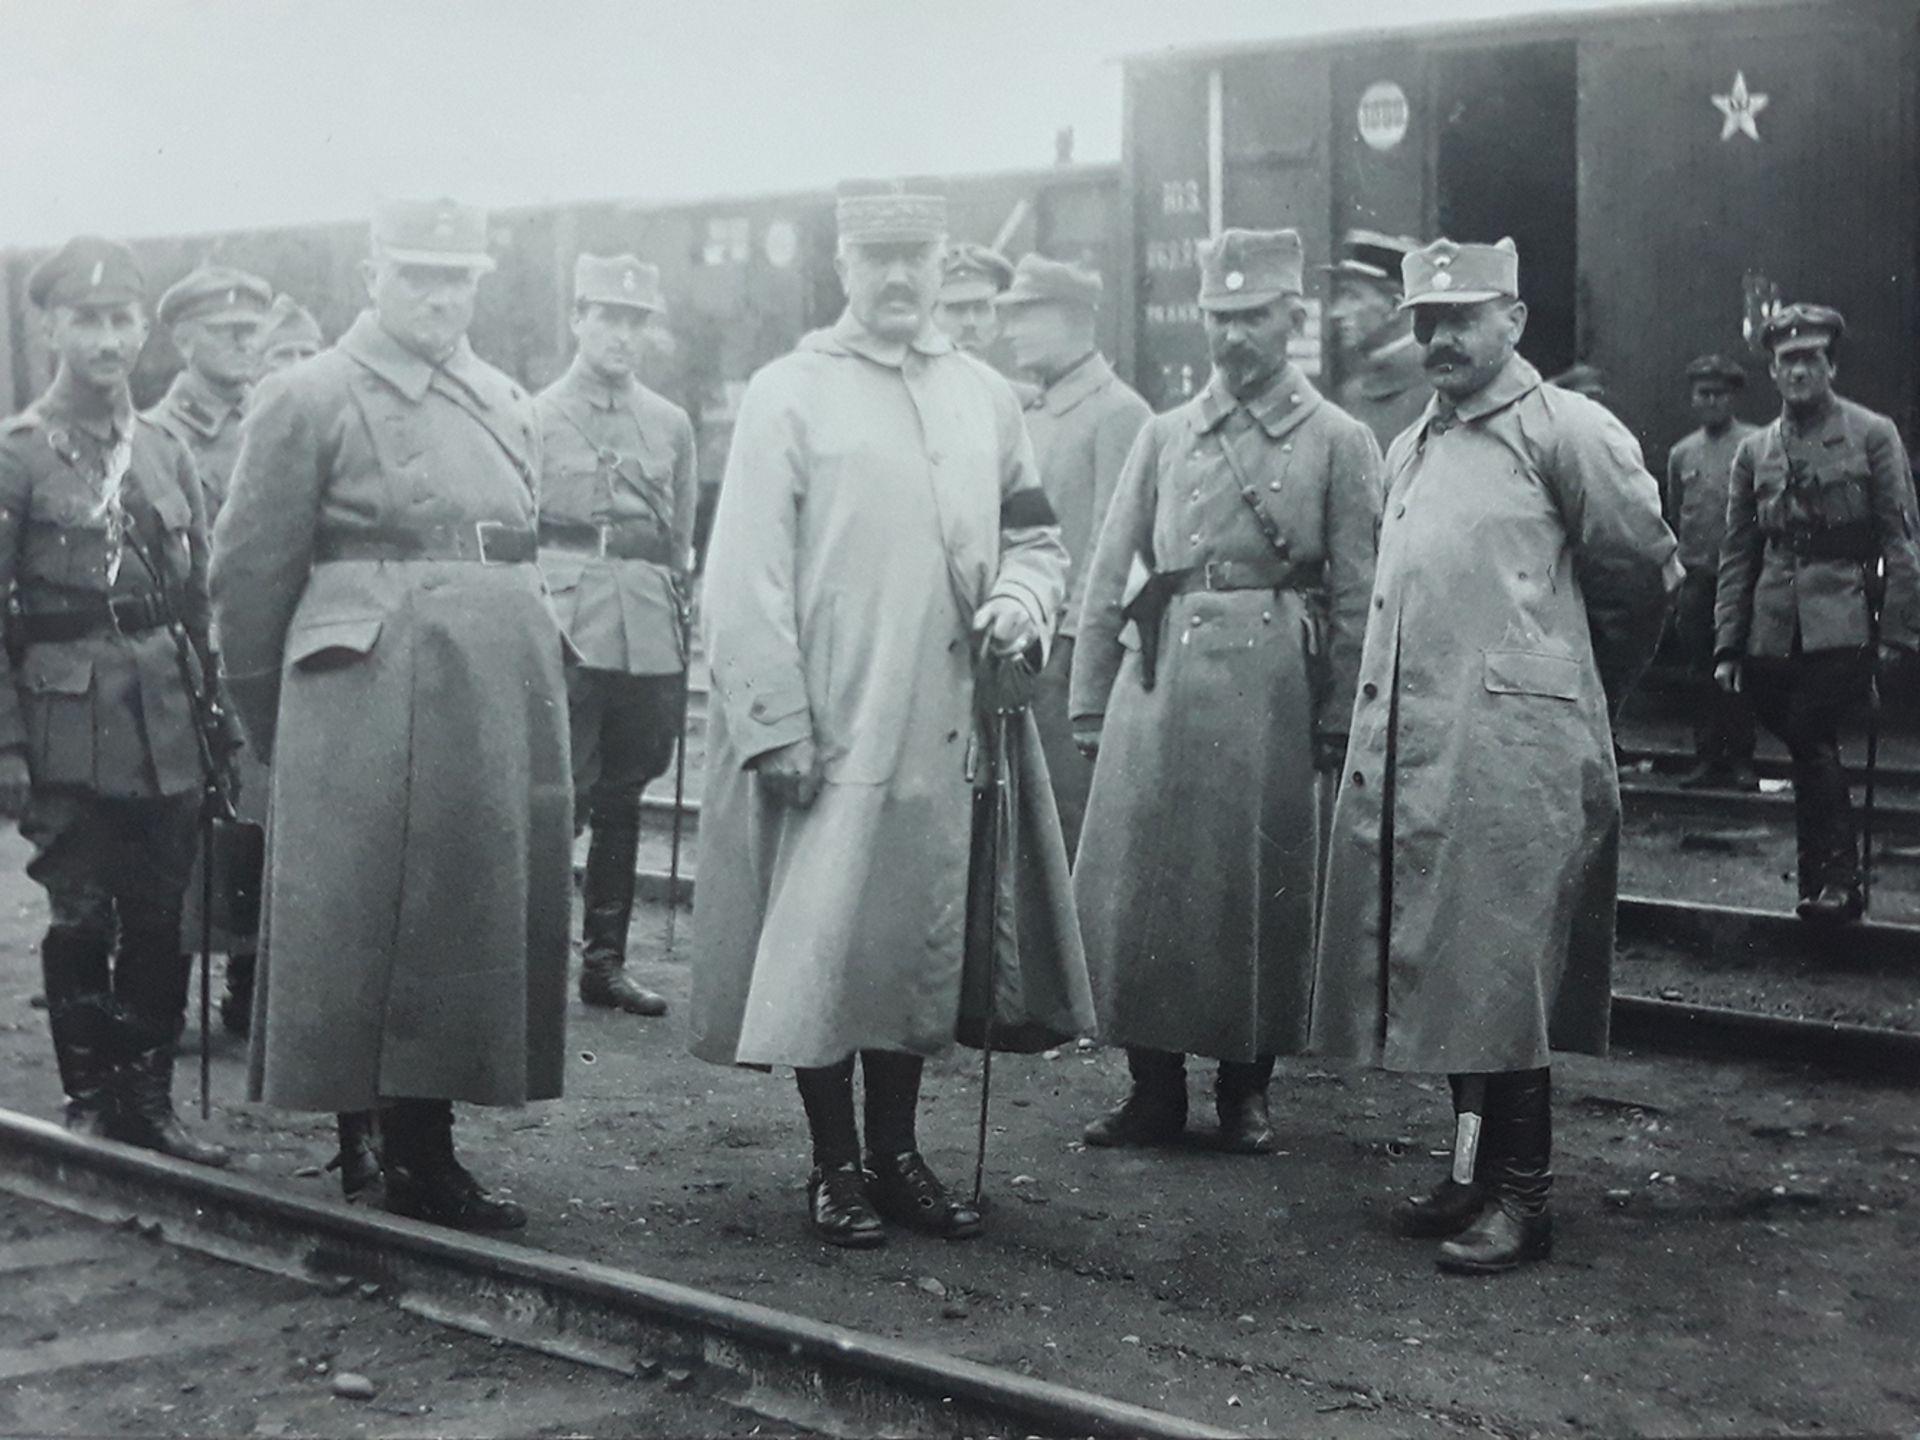 [Soviet]. Chief of Czechoslovak Legioners in Siberia Jan Syrový and Jean Jeanen. Photograph. Vladivo